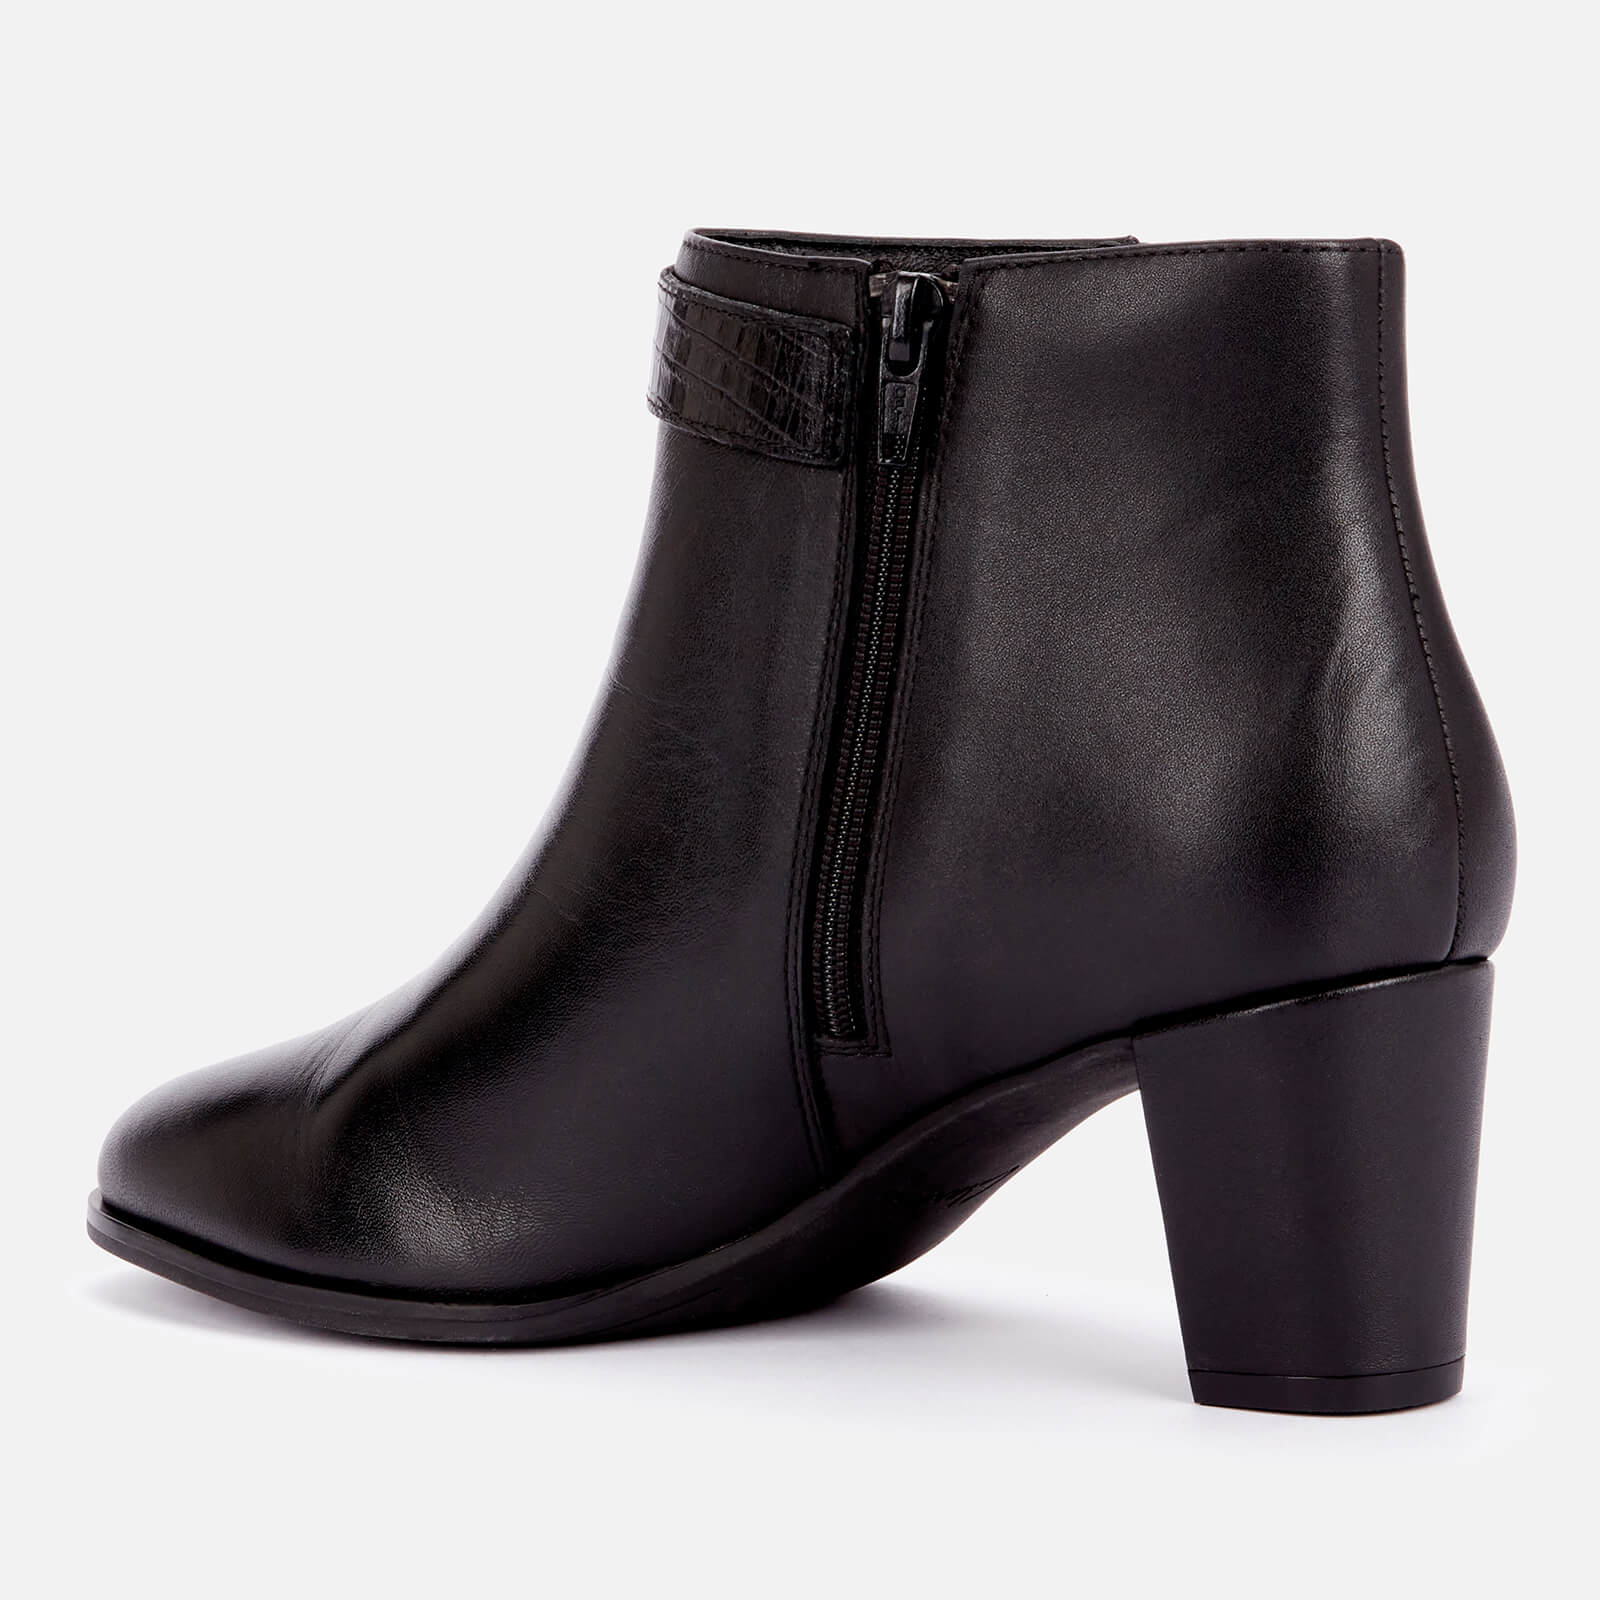 Clarks Women's Kaylin60 Leather Heeled Ankle Boots - Black - Uk 3